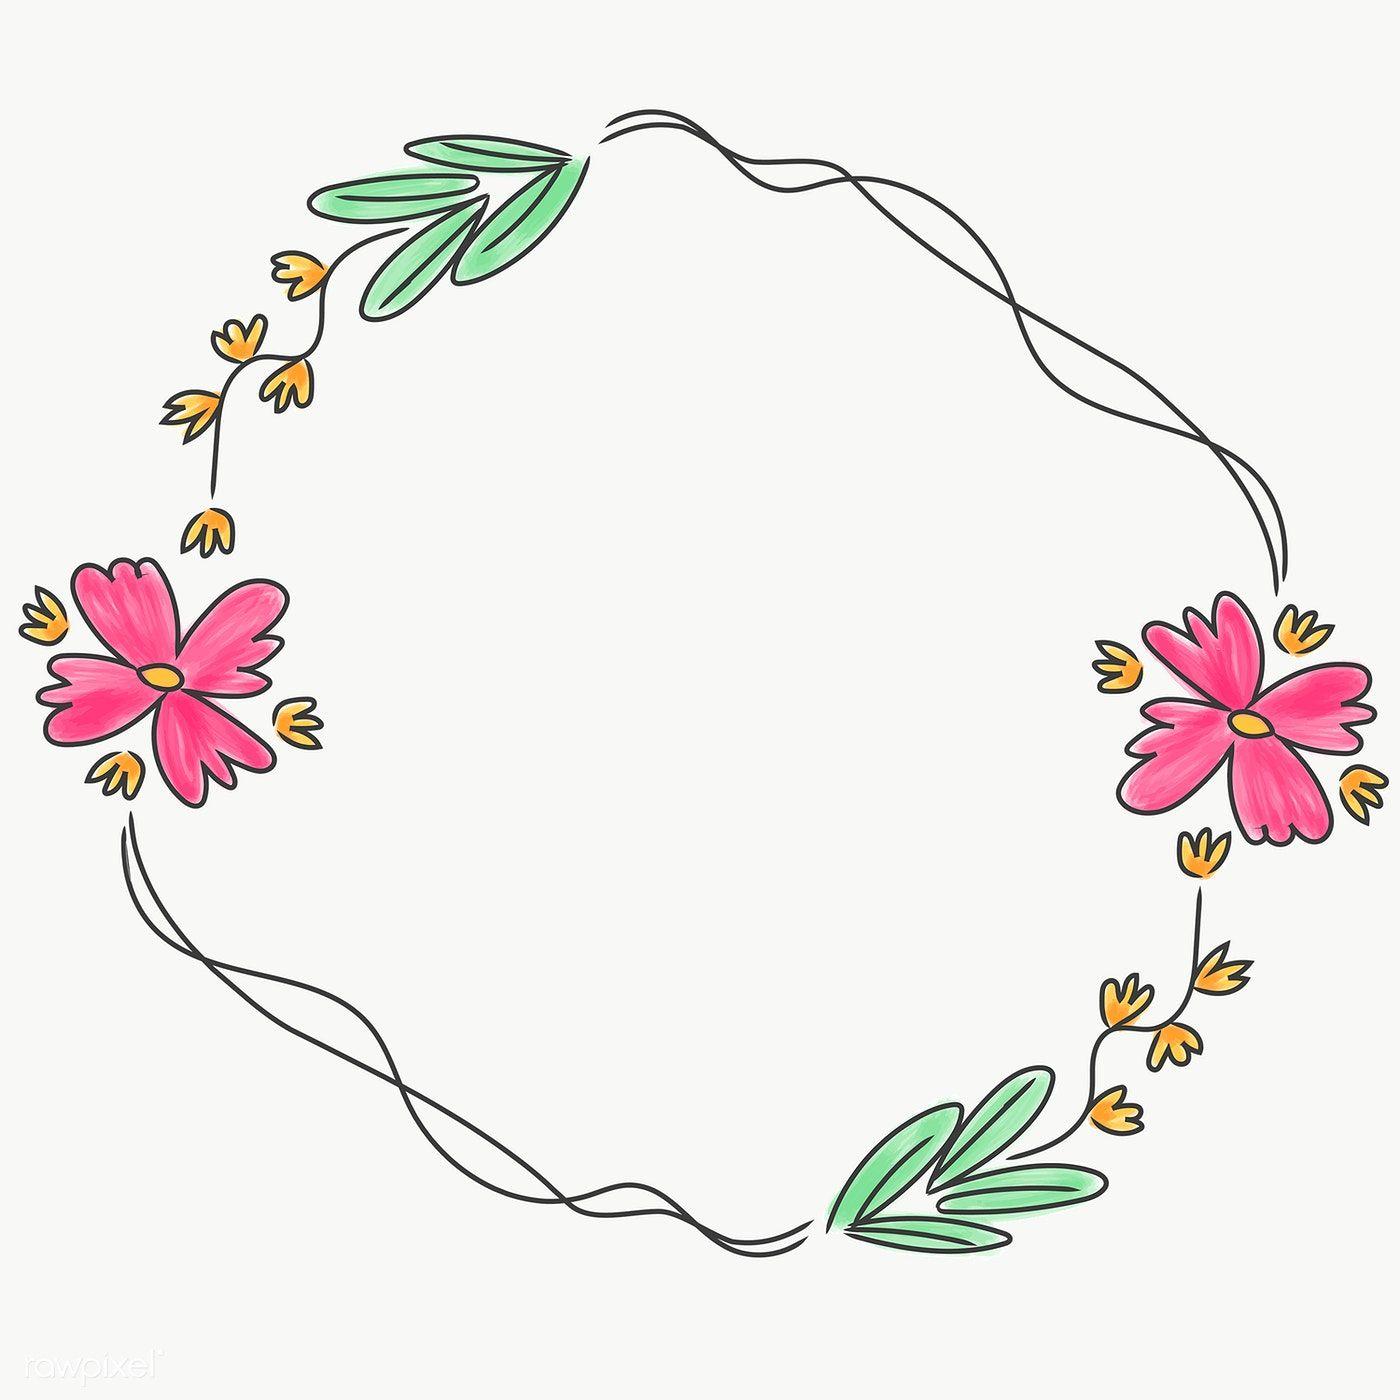 Cute Doodle Floral Wreath Transparent Png Free Image By Rawpixel Com Pimmy Flower Logo Design Flower Wreath Illustration Floral Poster